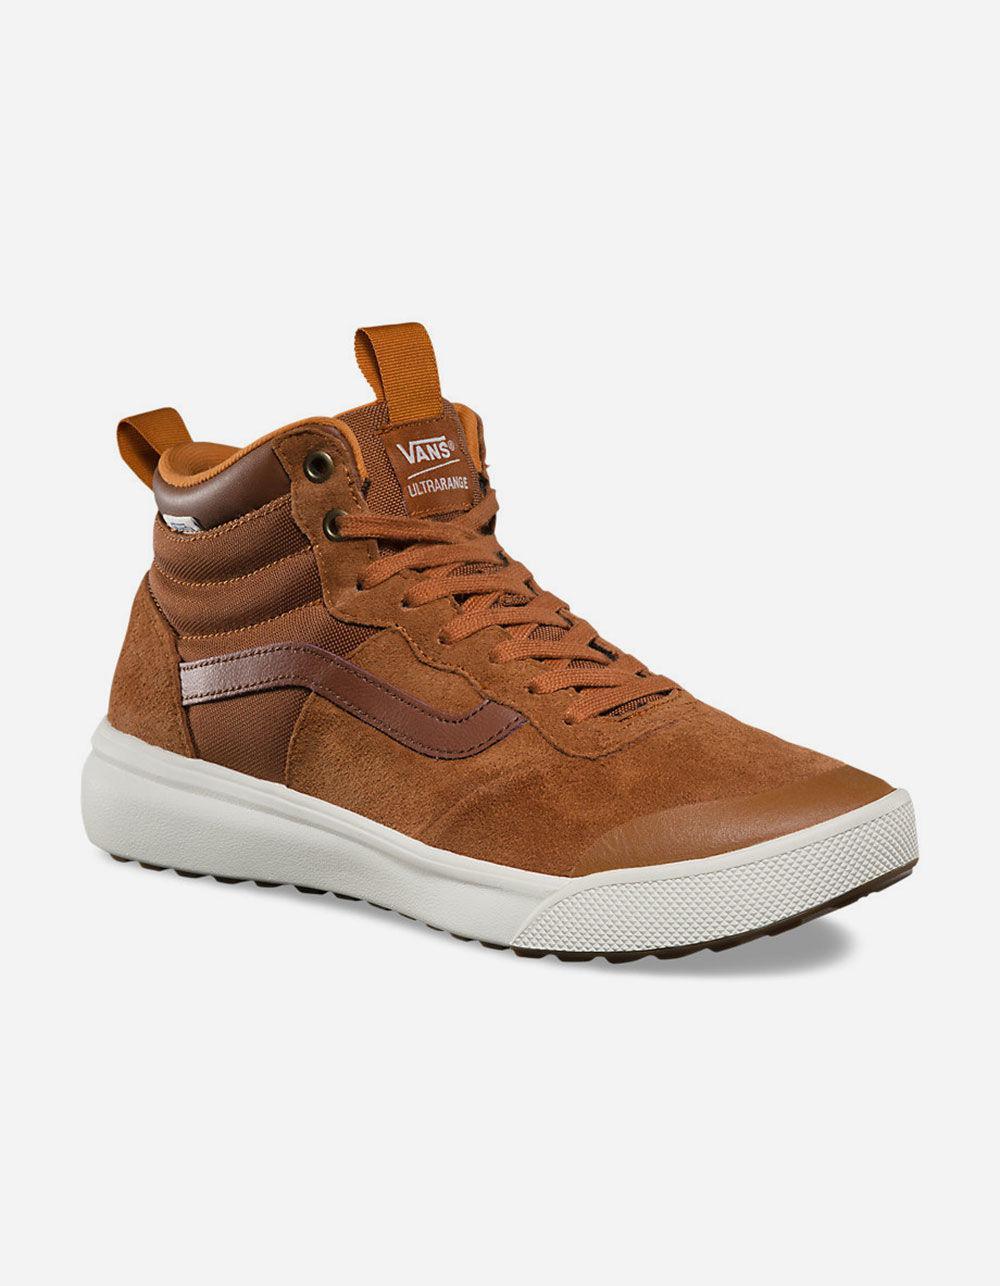 a0154b07e7 Lyst - Vans Ultrarange Hi Mte Mens Shoes in Brown for Men